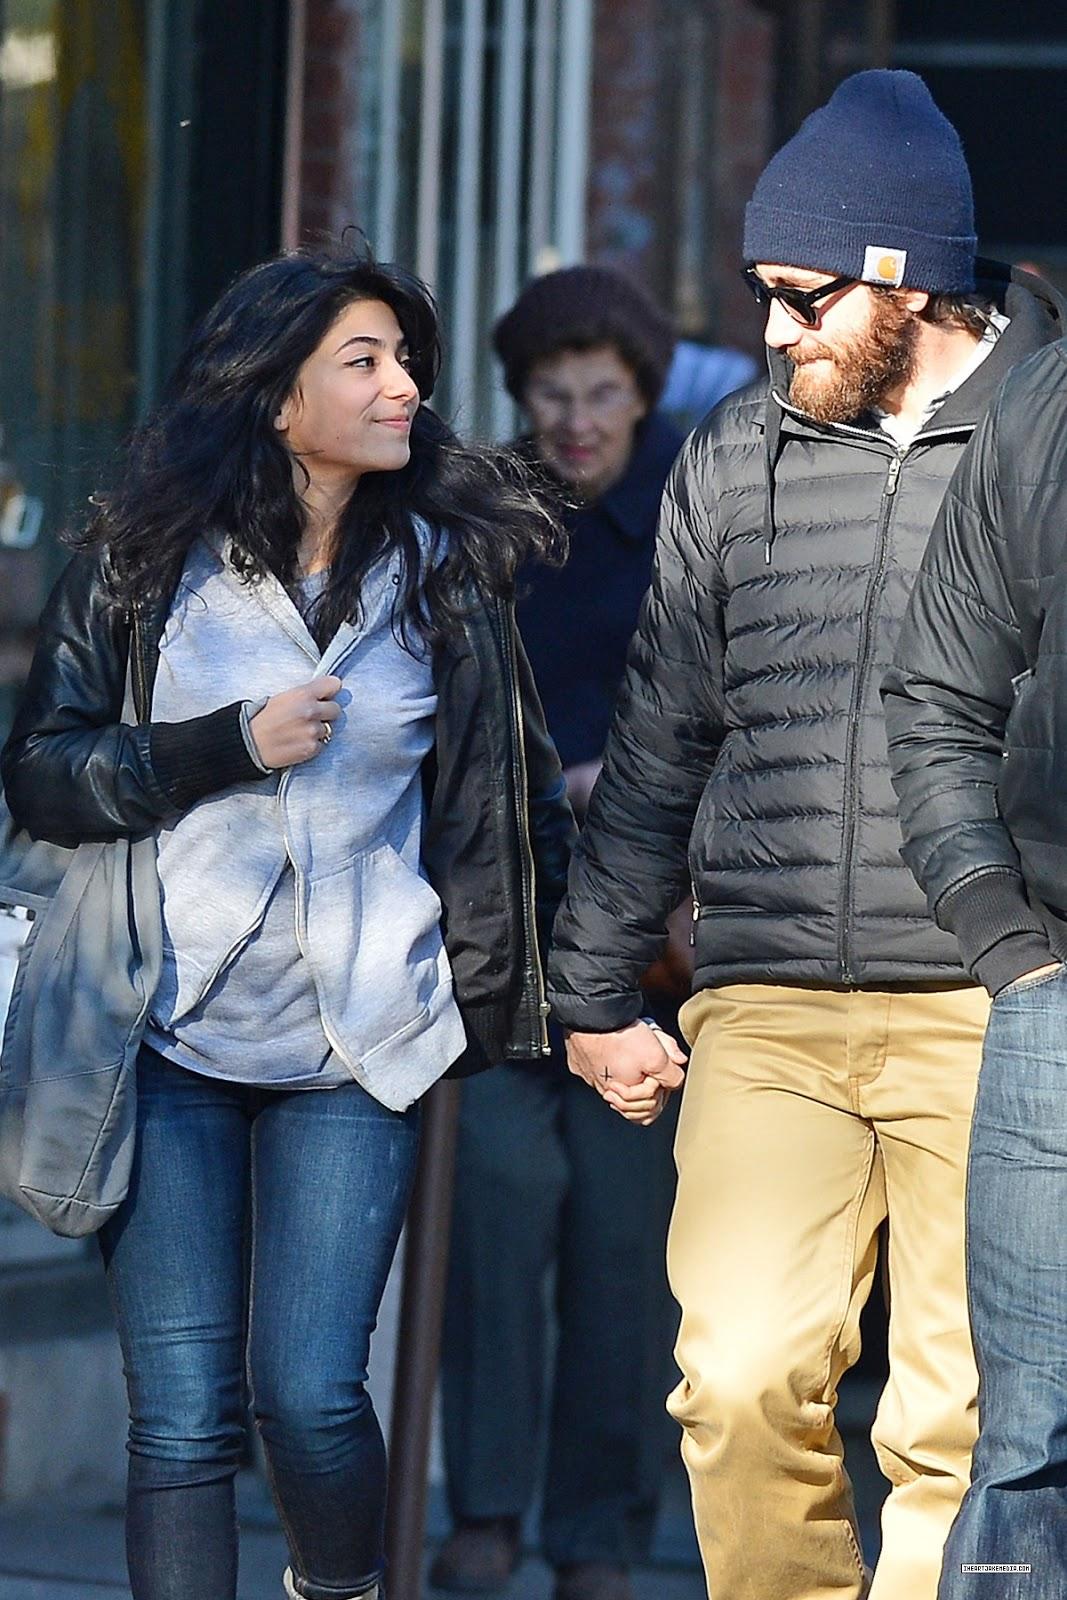 Jake gyllenhaal dating 2012